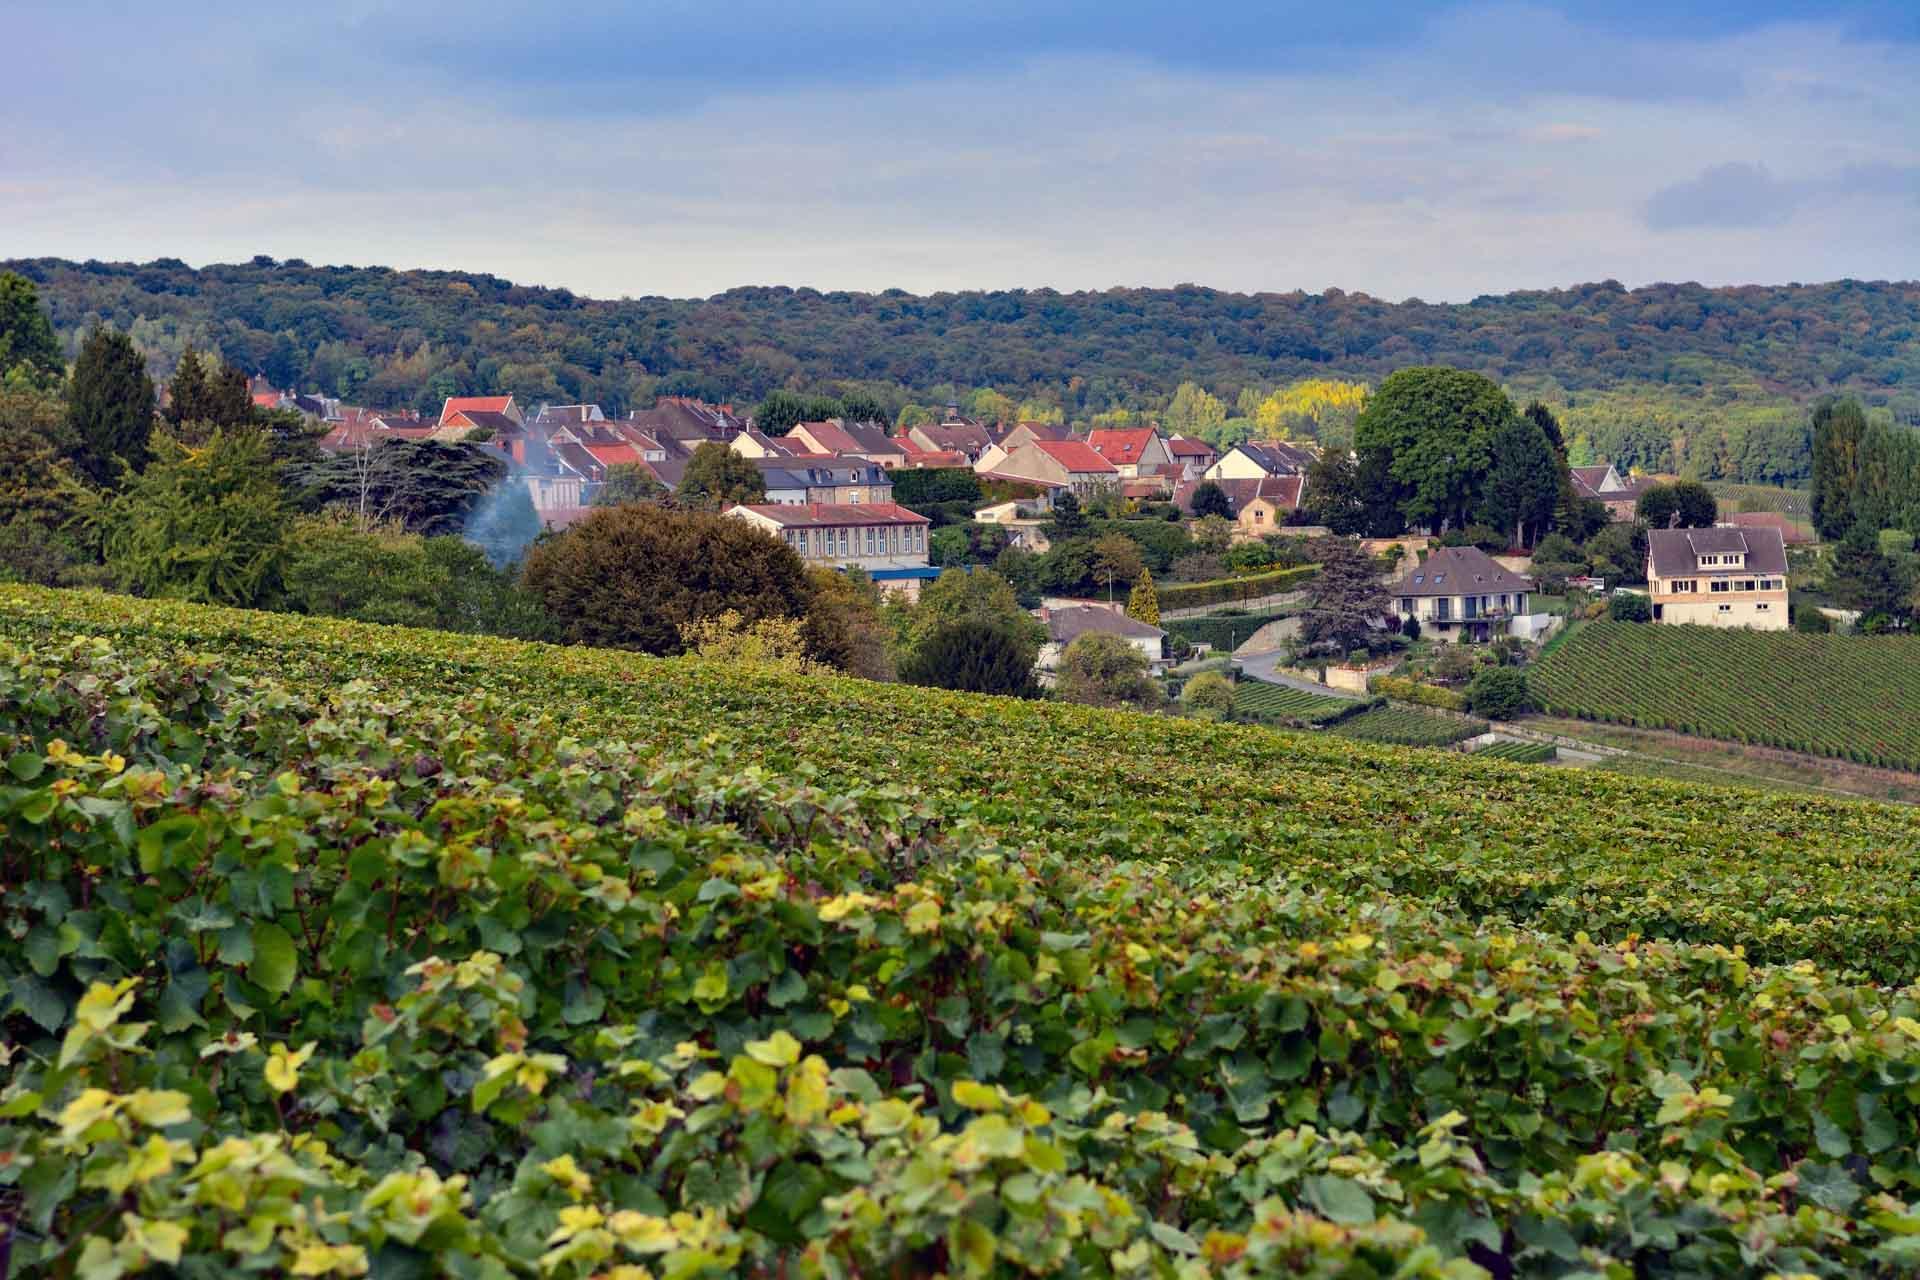 Décor typique de la Montagne de Reims, ici dans la zone d'Hautvillers © adobestock - Sergii Zinko